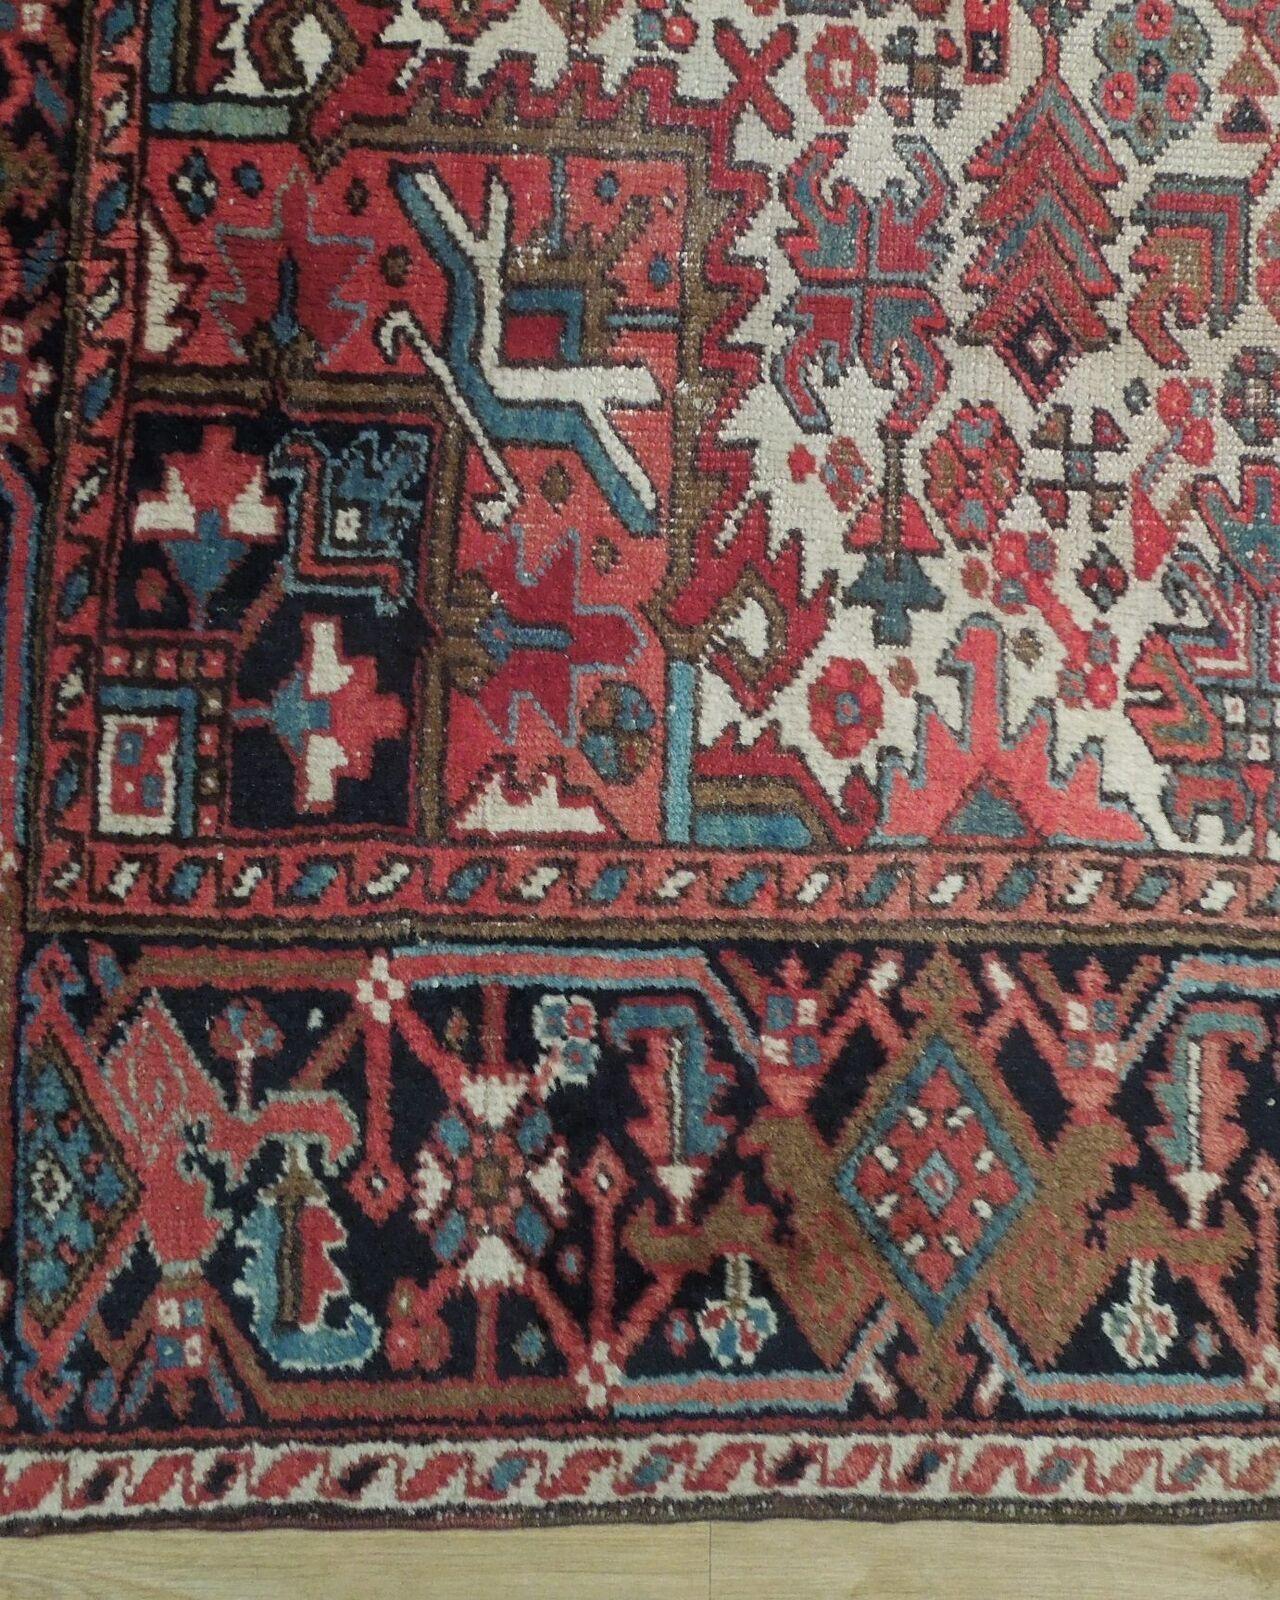 Normal Wear Semi-Antique Persian Handmade 9x12 Burgundy Heriz Wool Rug image 3